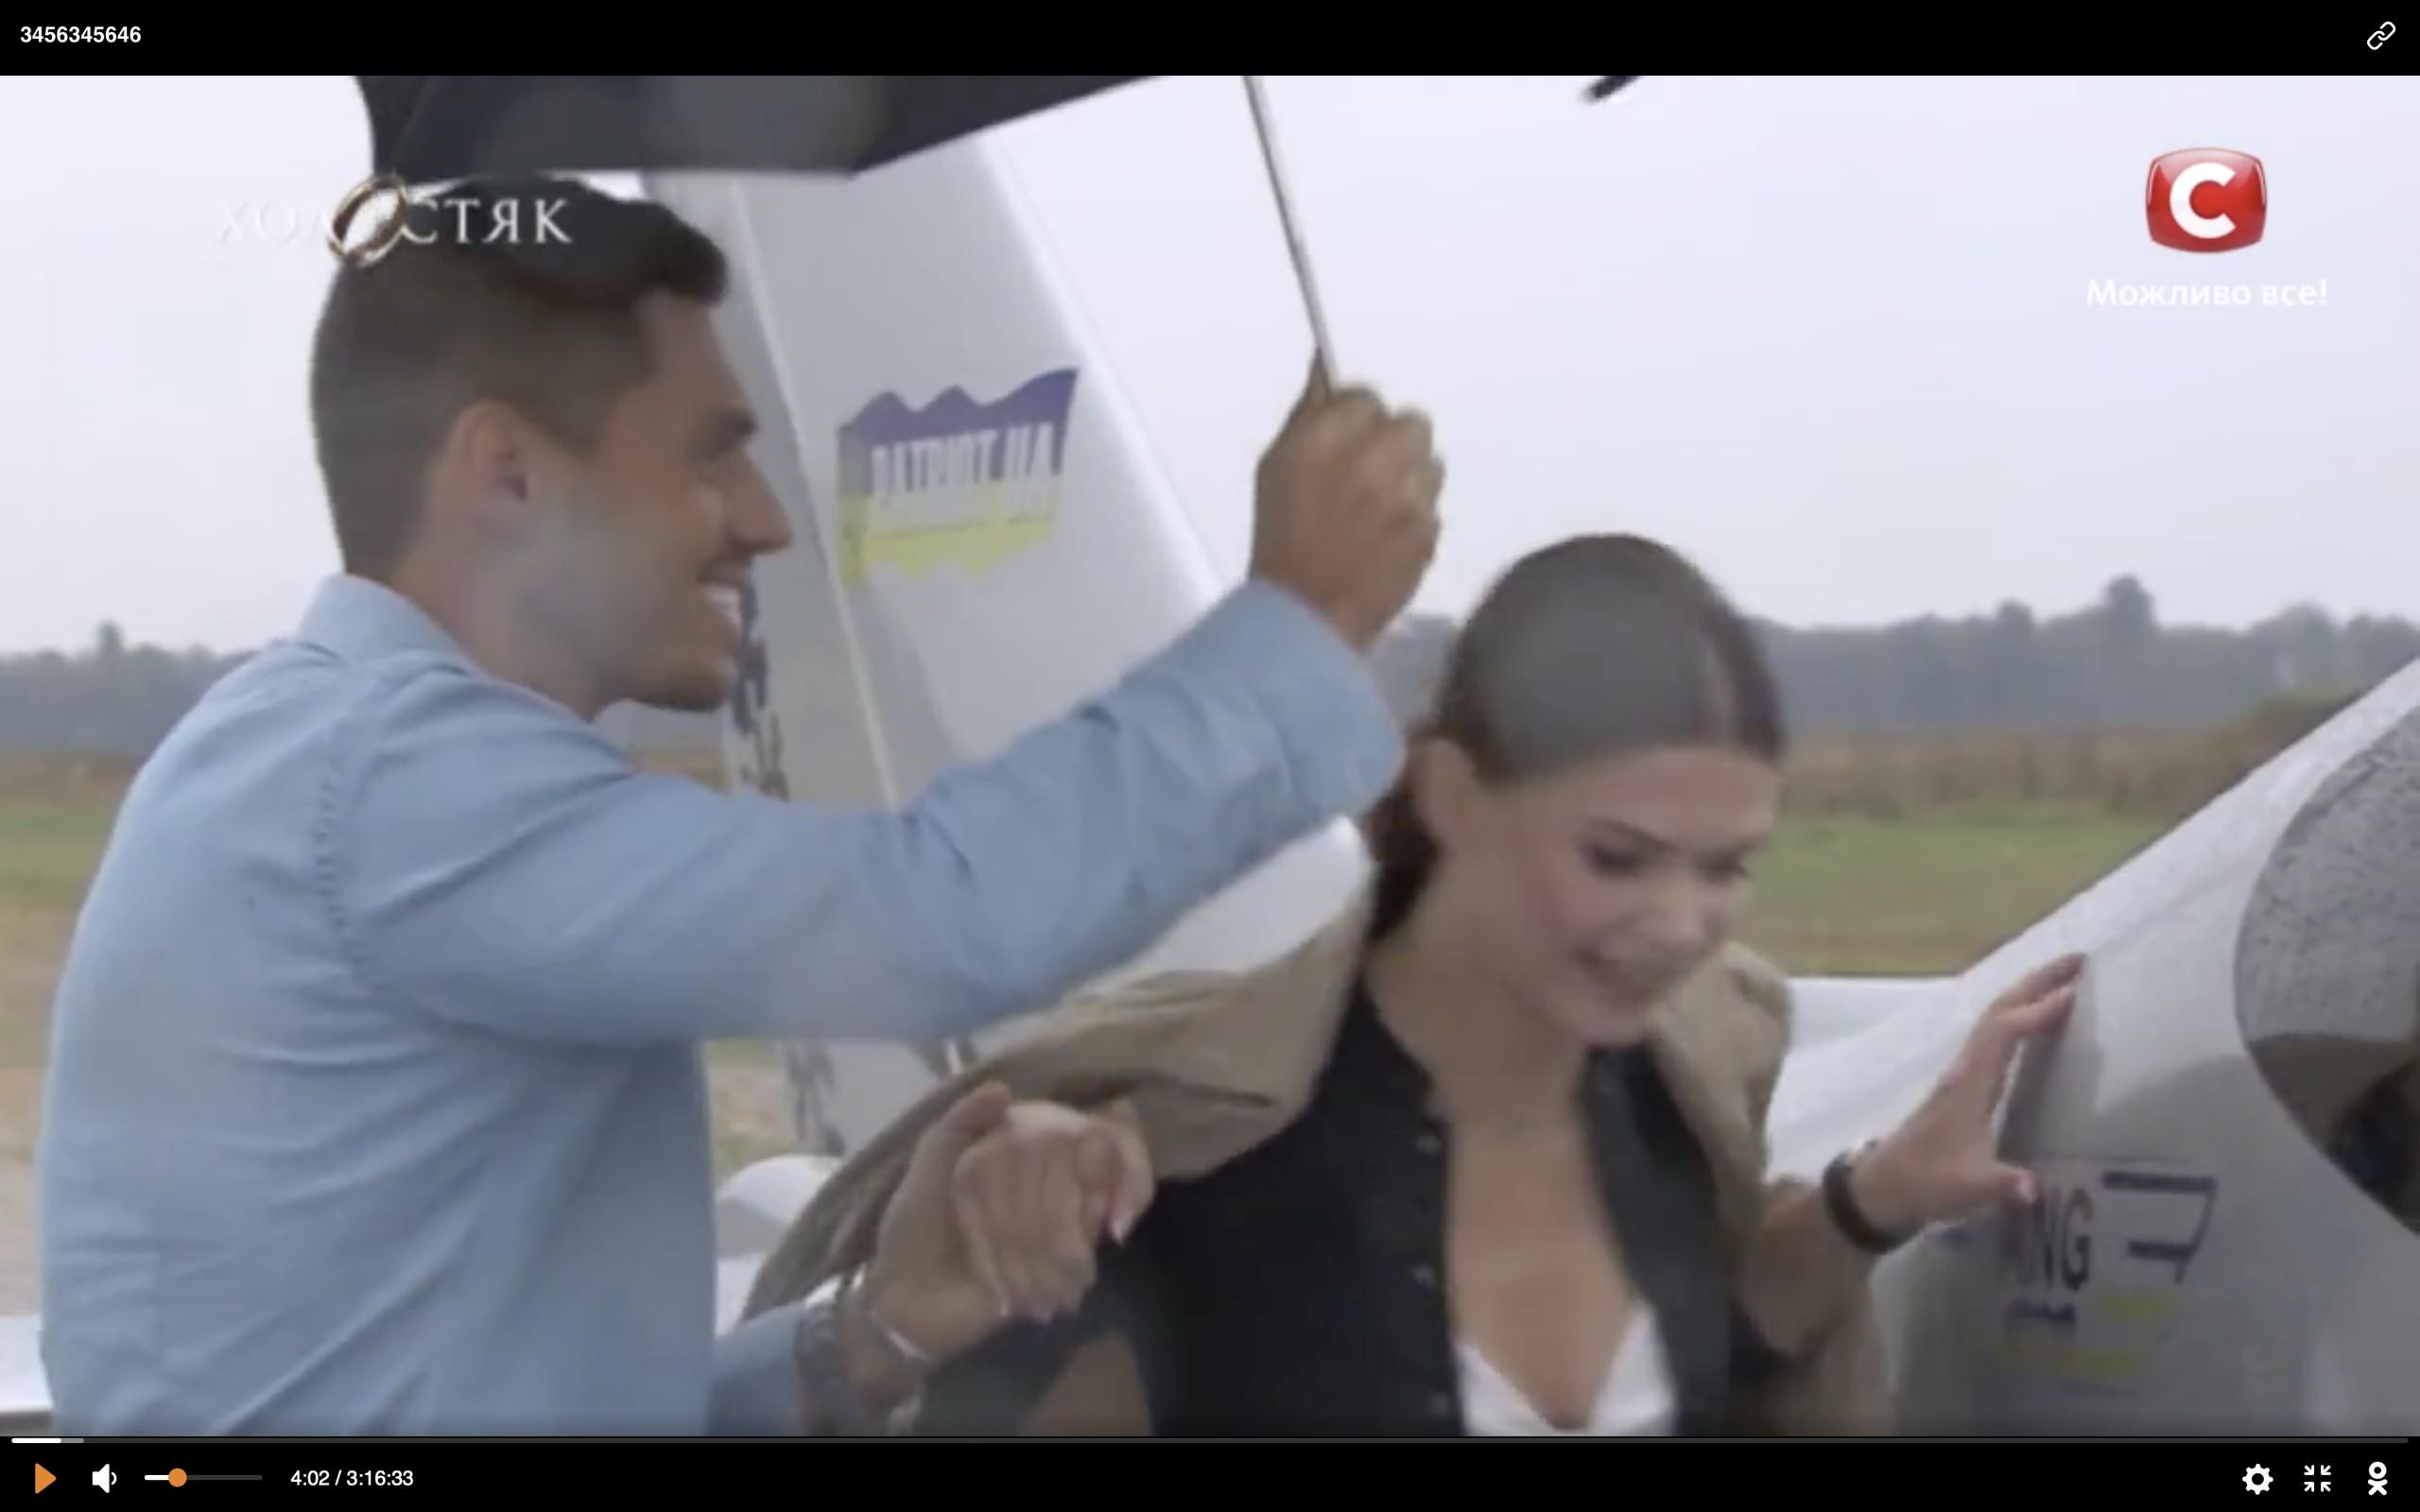 Bachelor Ukraine - Season 9 - Nikita Dobrynin - *Sleuthing Spoilers* - Page 10 MAr-2XvU860